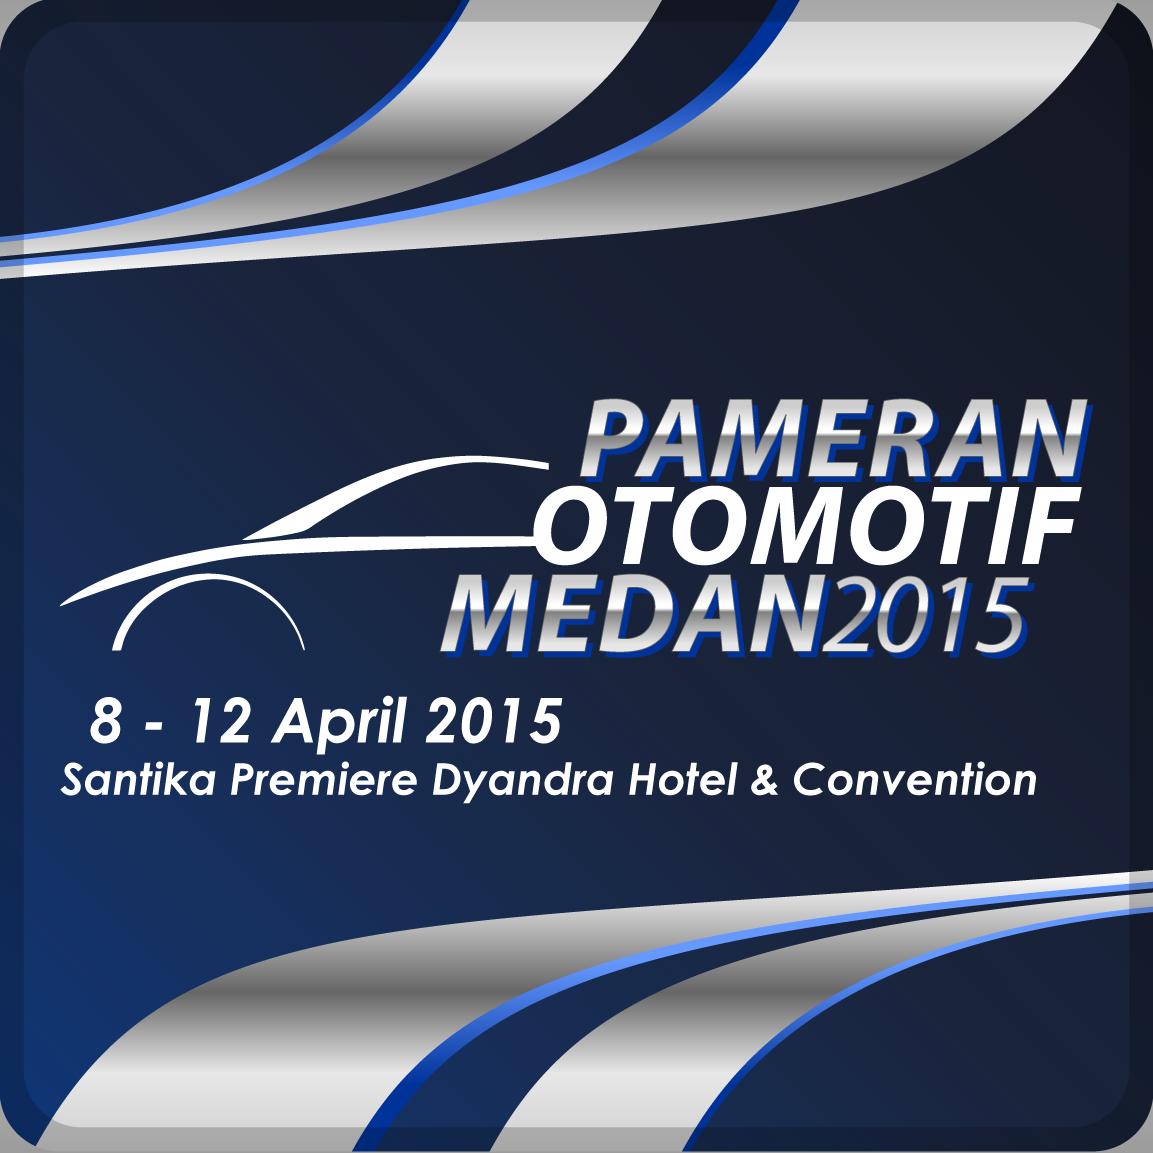 Pameran Otomotif Medan 2015